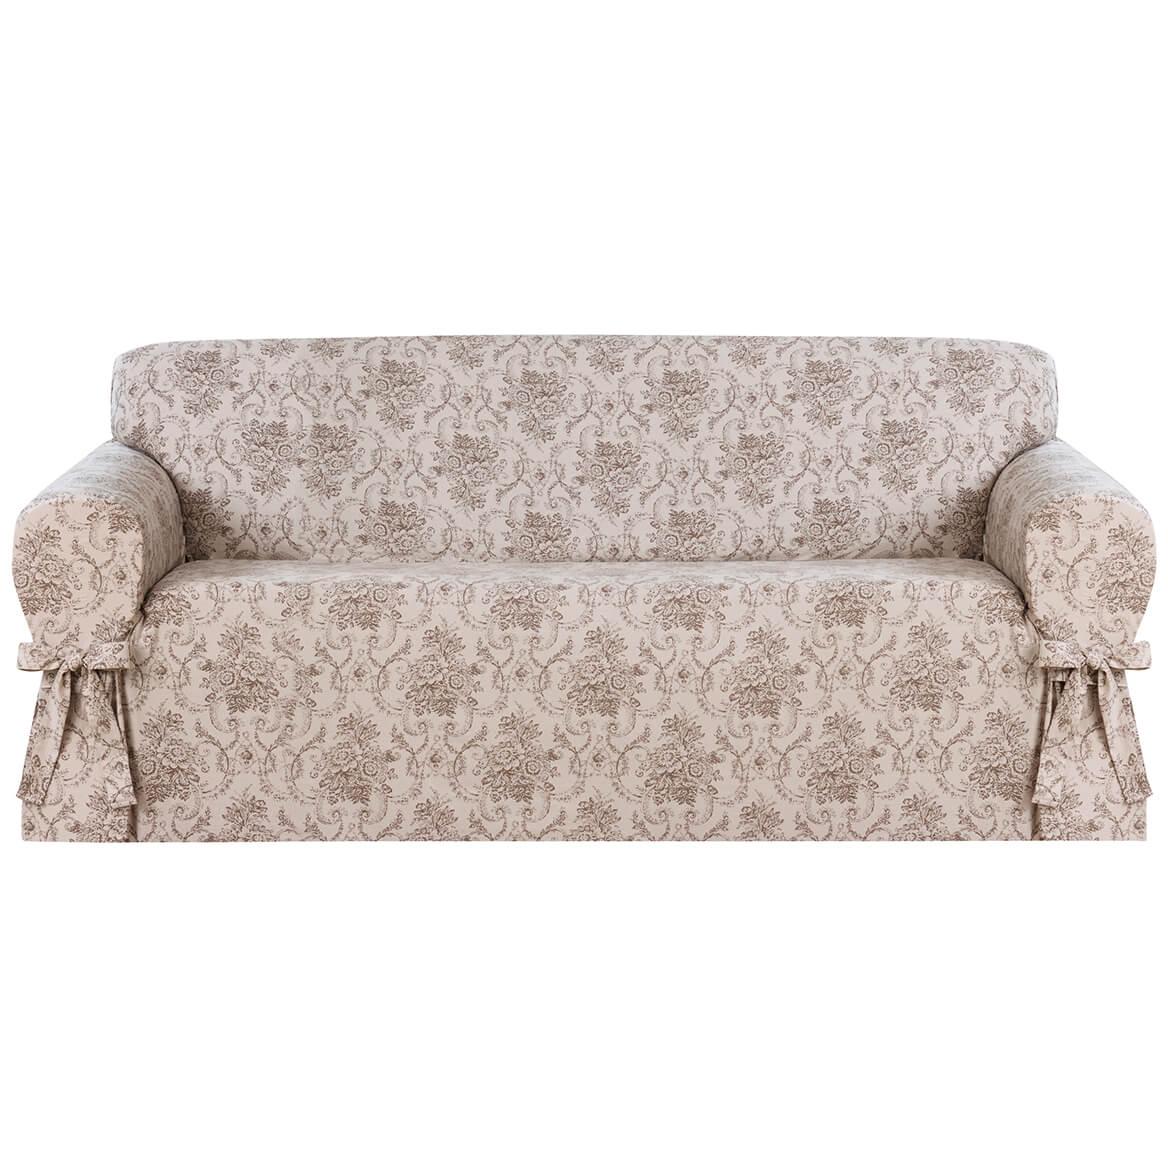 Kathy Ireland Cau Sofa Slipcover